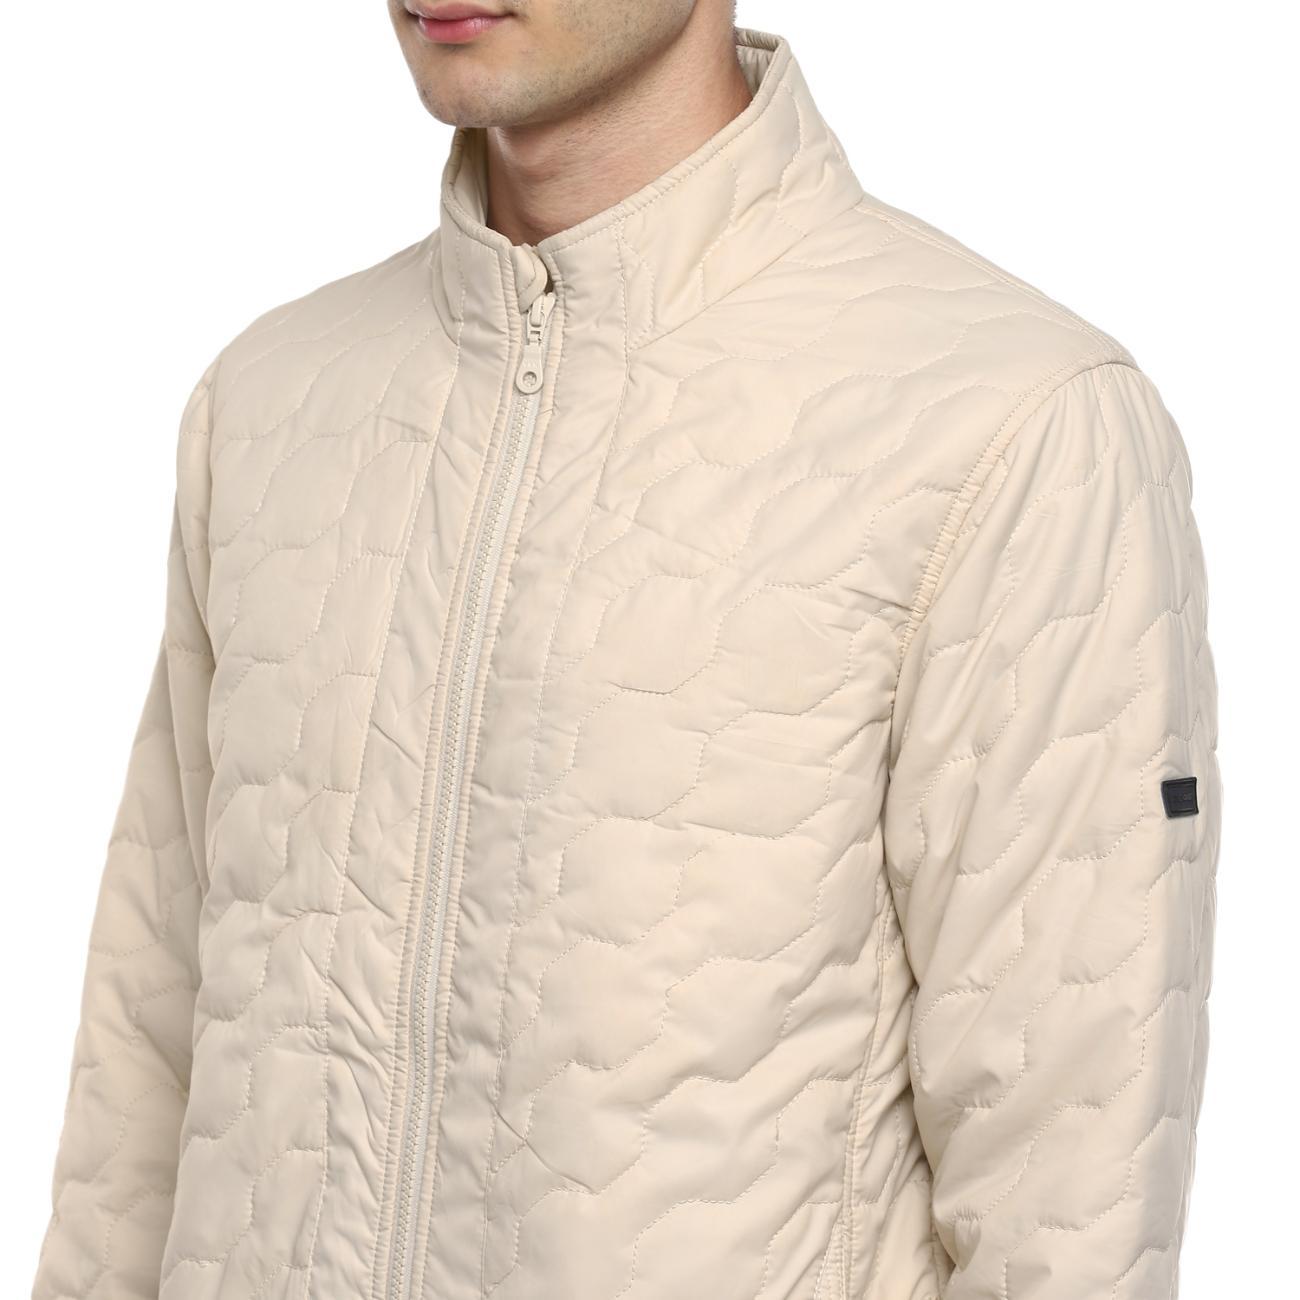 Cream Jacket Online at Red Chief